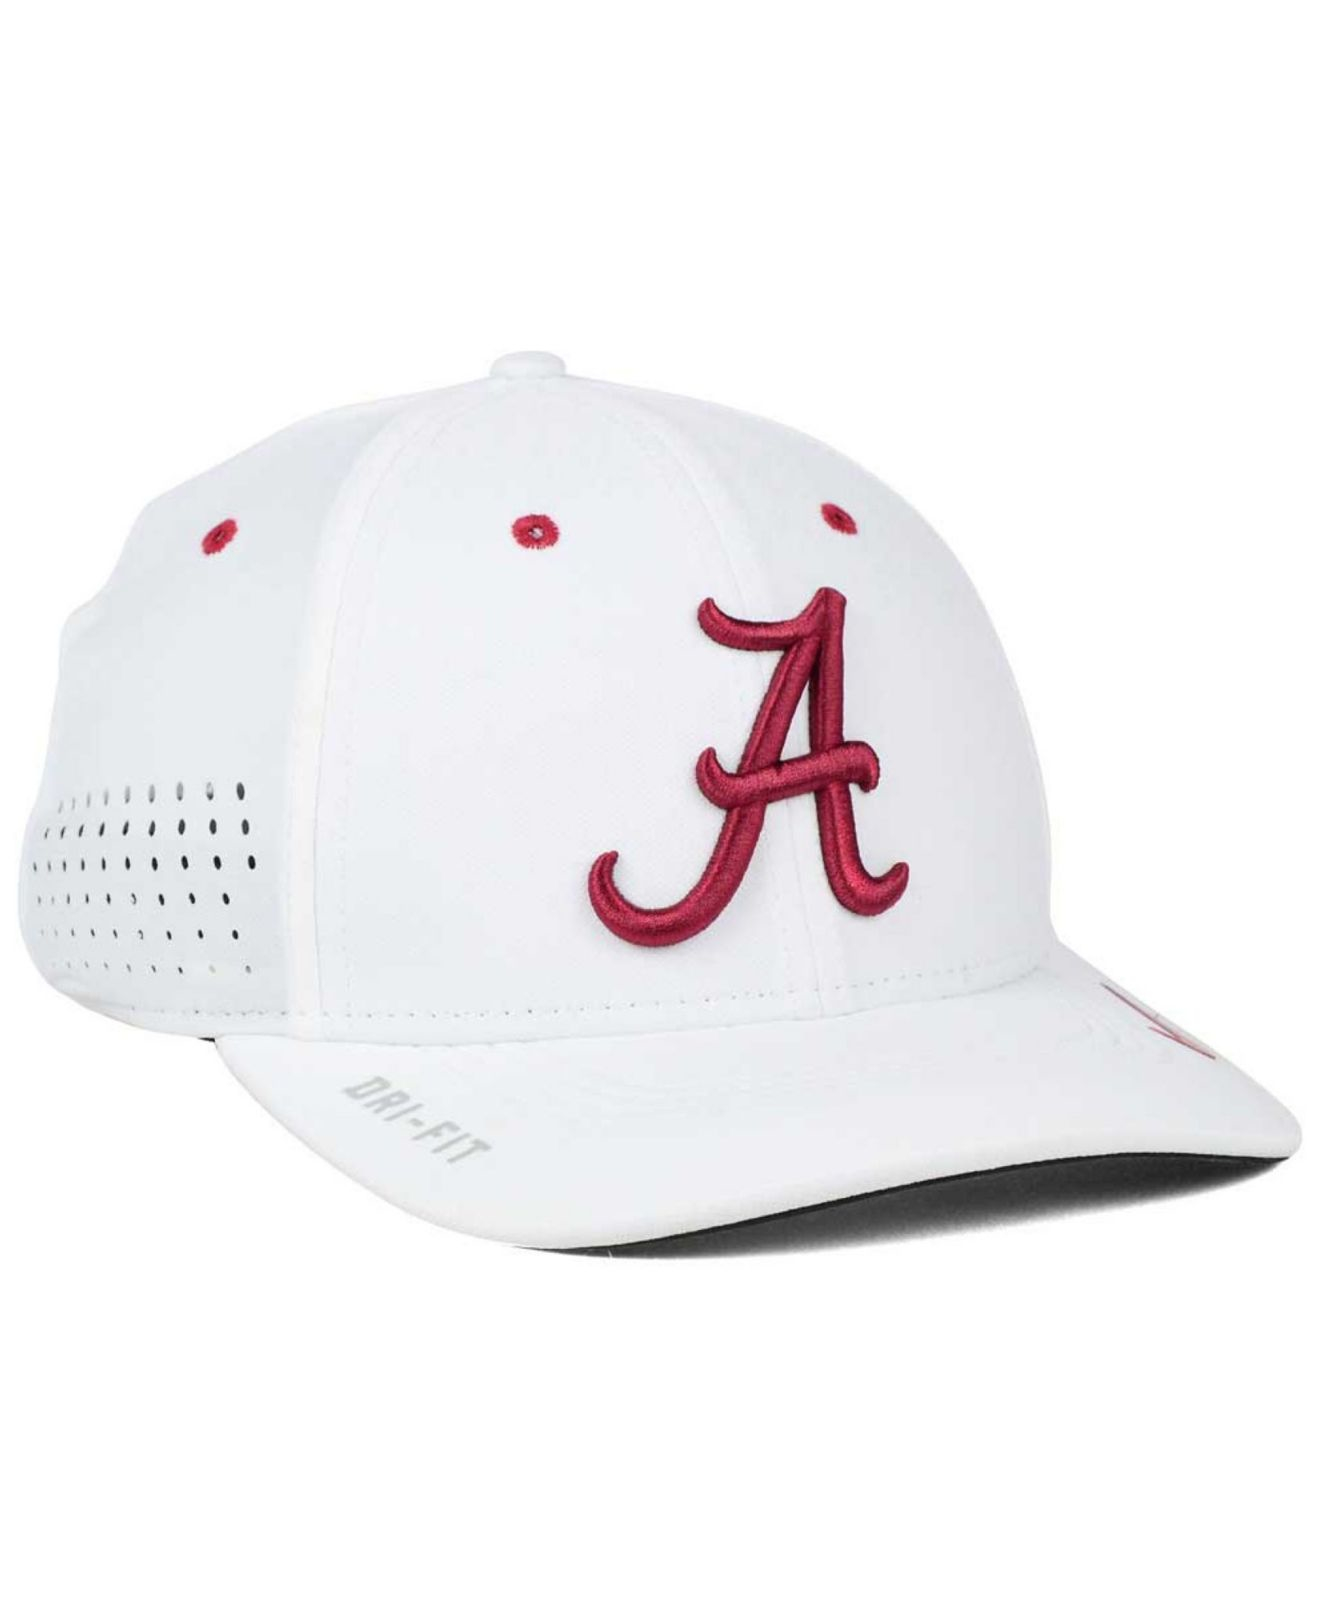 5b353bec27f ... promo code for lyst nike alabama crimson tide sideline cap in white for  men c81ec 80258